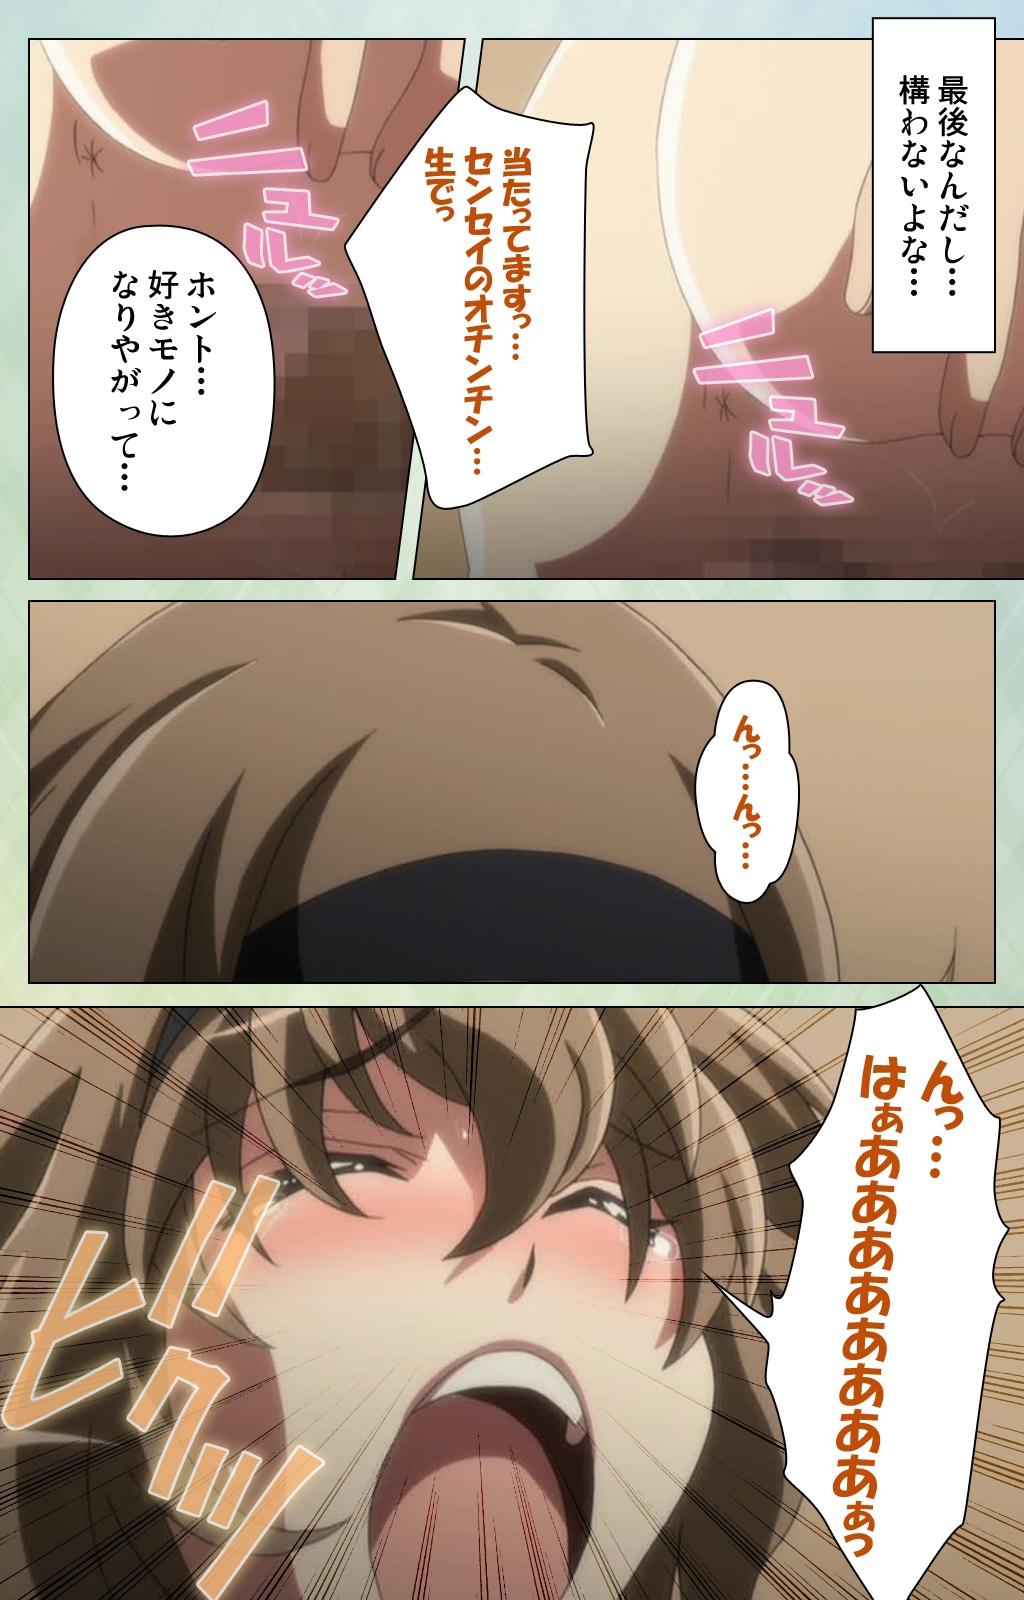 Furueru Kuchibiru fuzzy lips0 Complete Ban 24